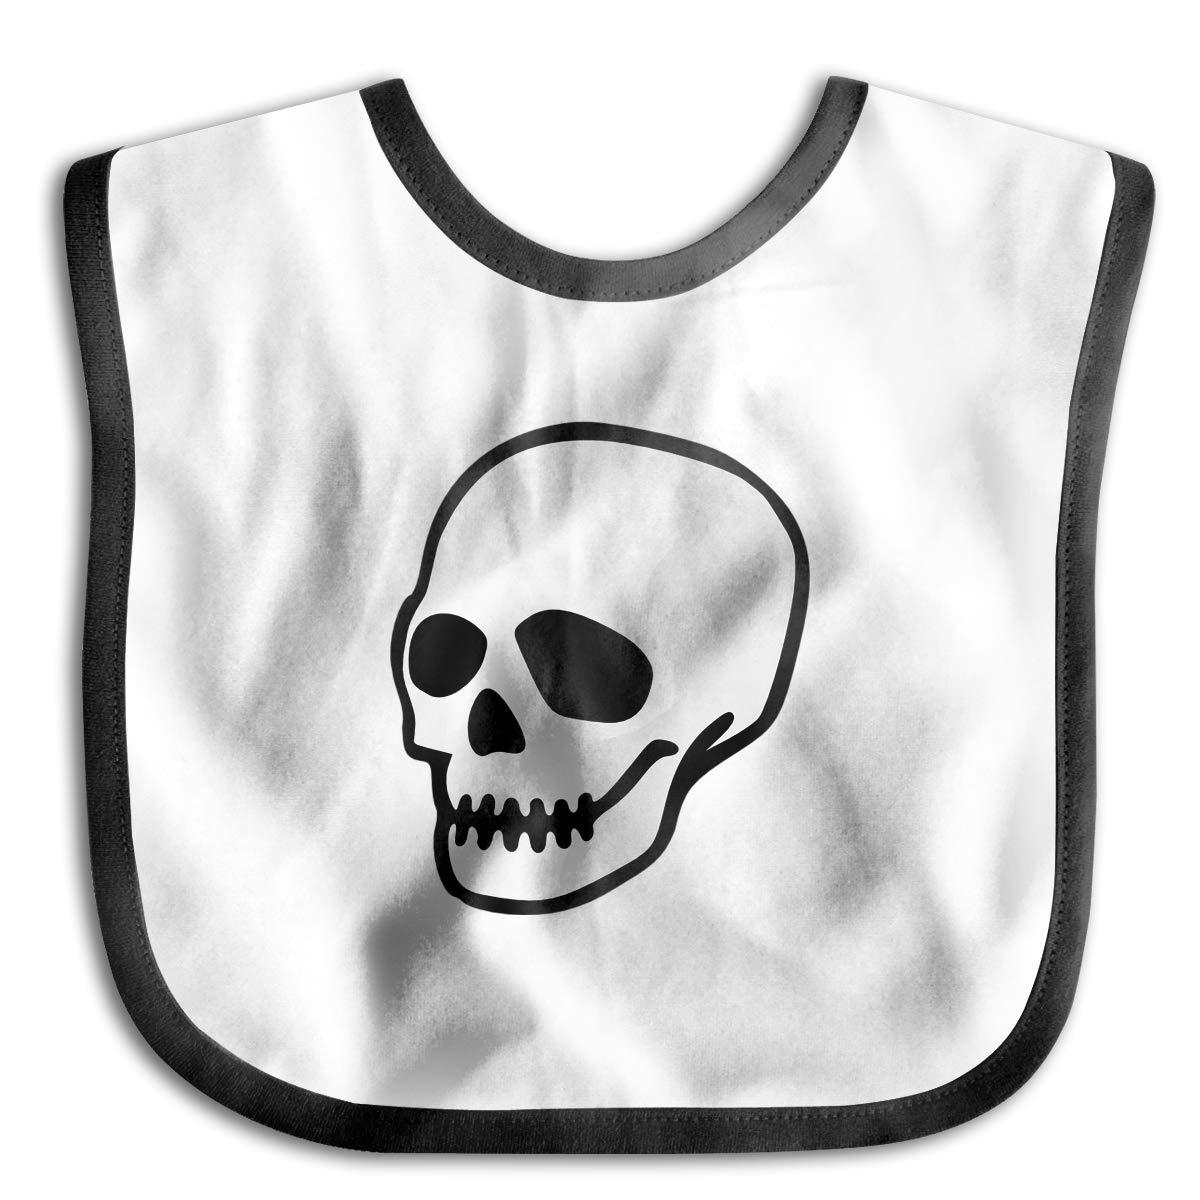 Sugar Skull Funny Baby Bibs Burp Infant Cloths Drool Toddler Teething Soft Absorbent